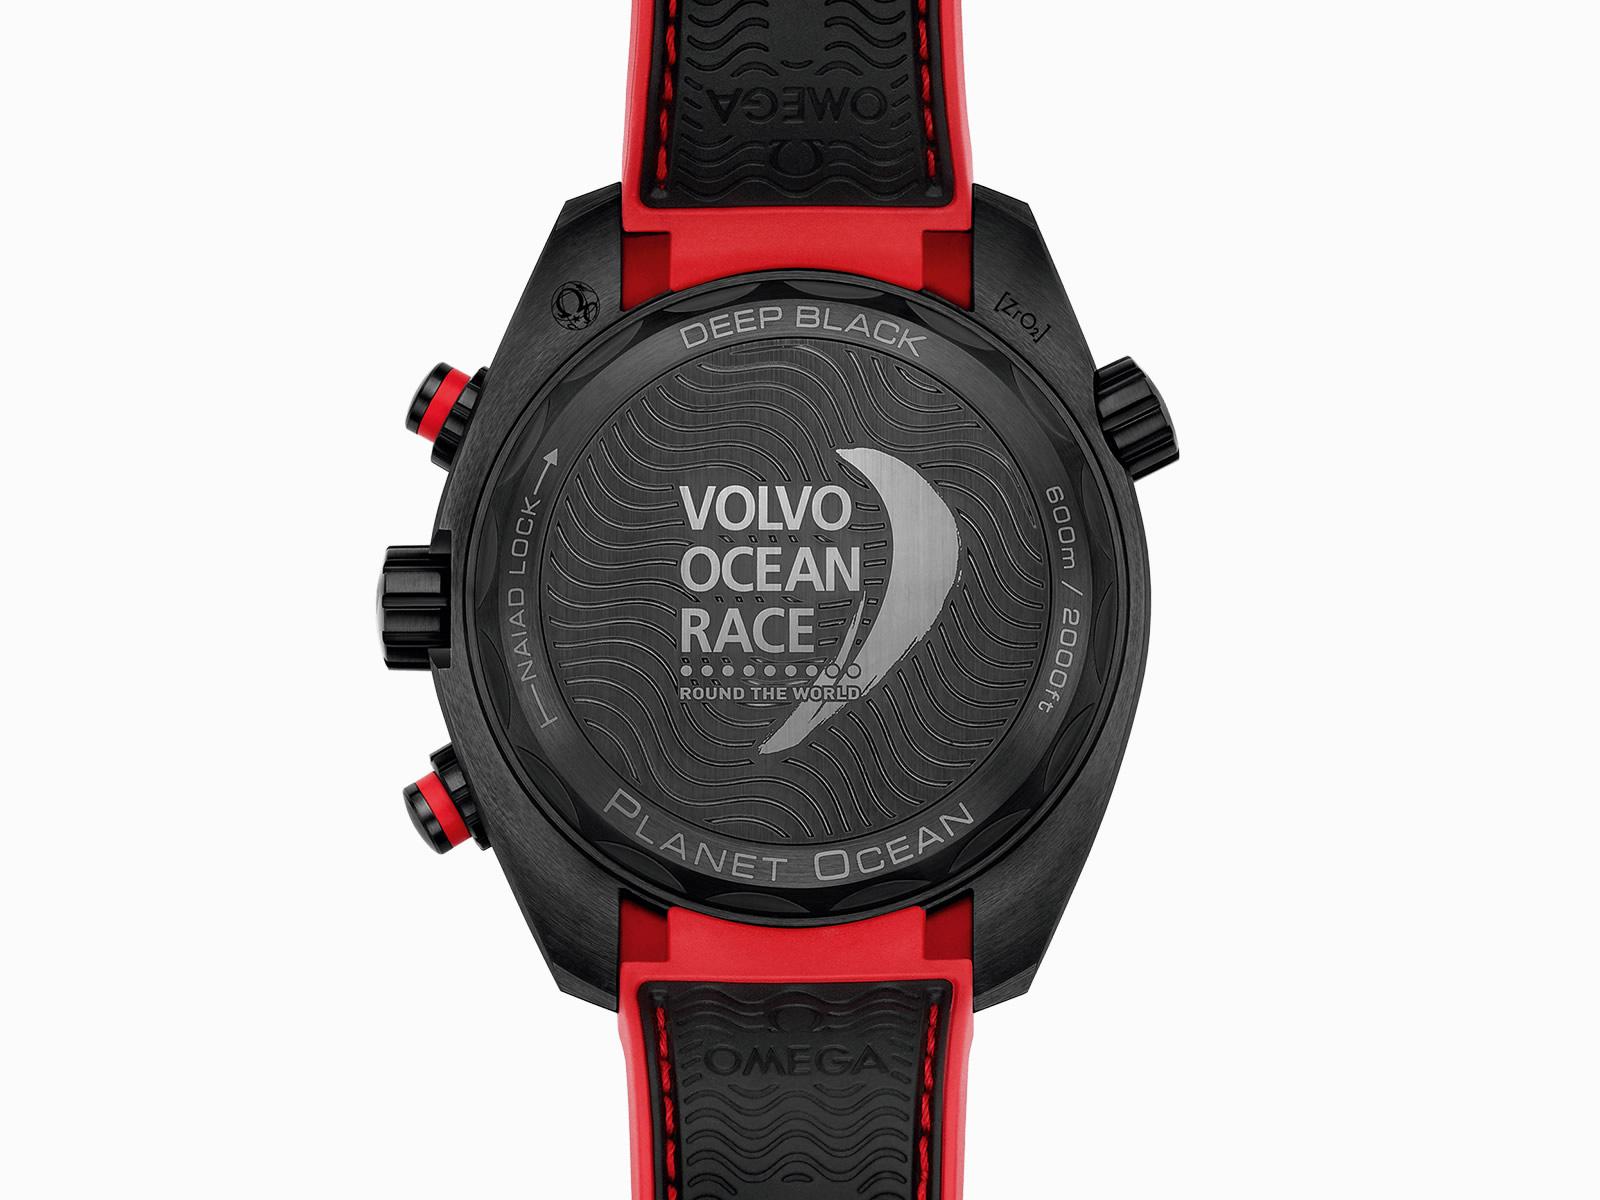 215-92-46-51-01-002-omega-seamaster-planet-ocean-volvo-ocean-race-limited-edition-6-.jpg